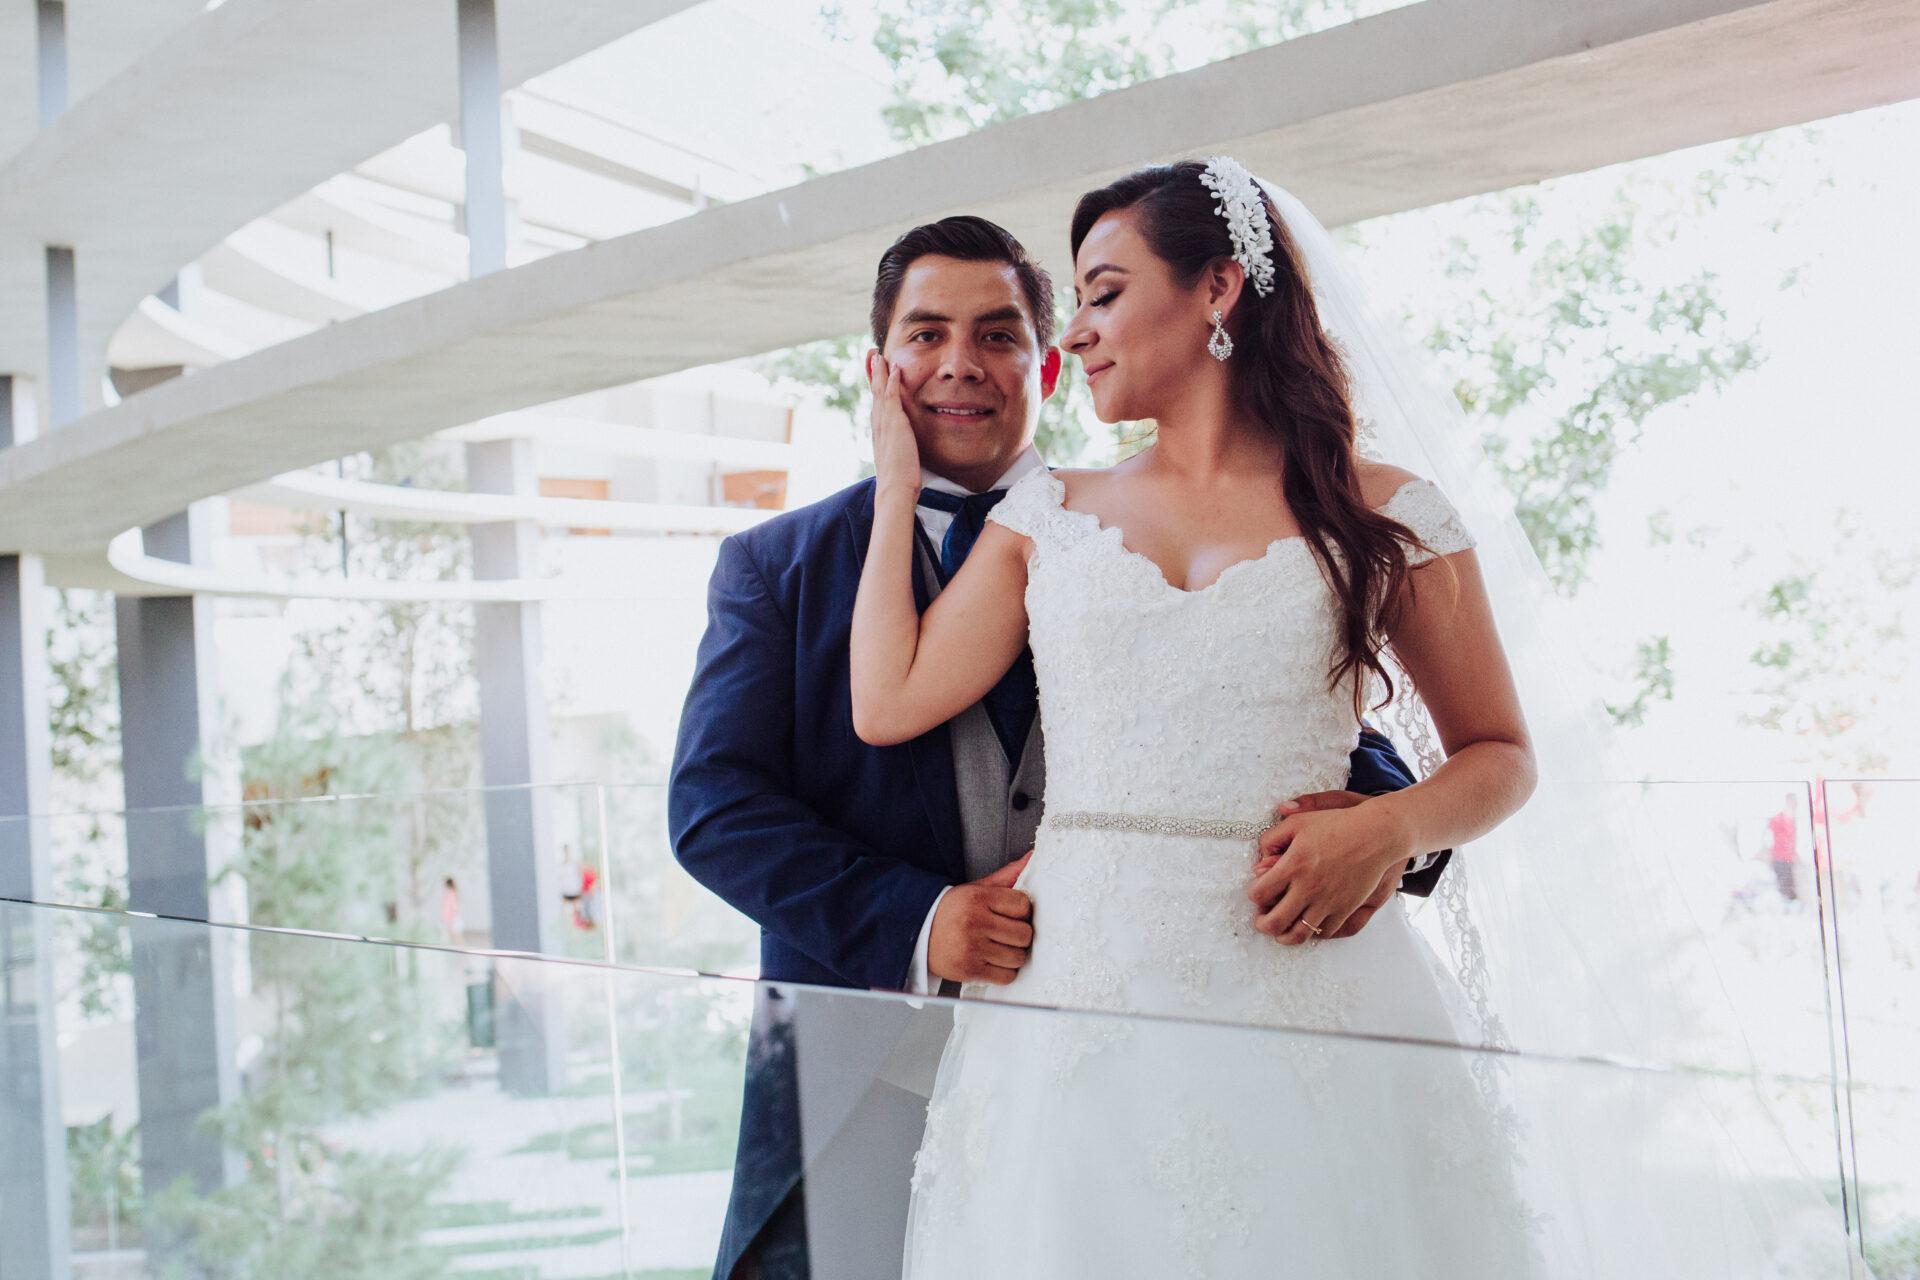 javier_noriega_fotografo_bodas_torreon_coahuila_zacatecas_wedding_photographer23a